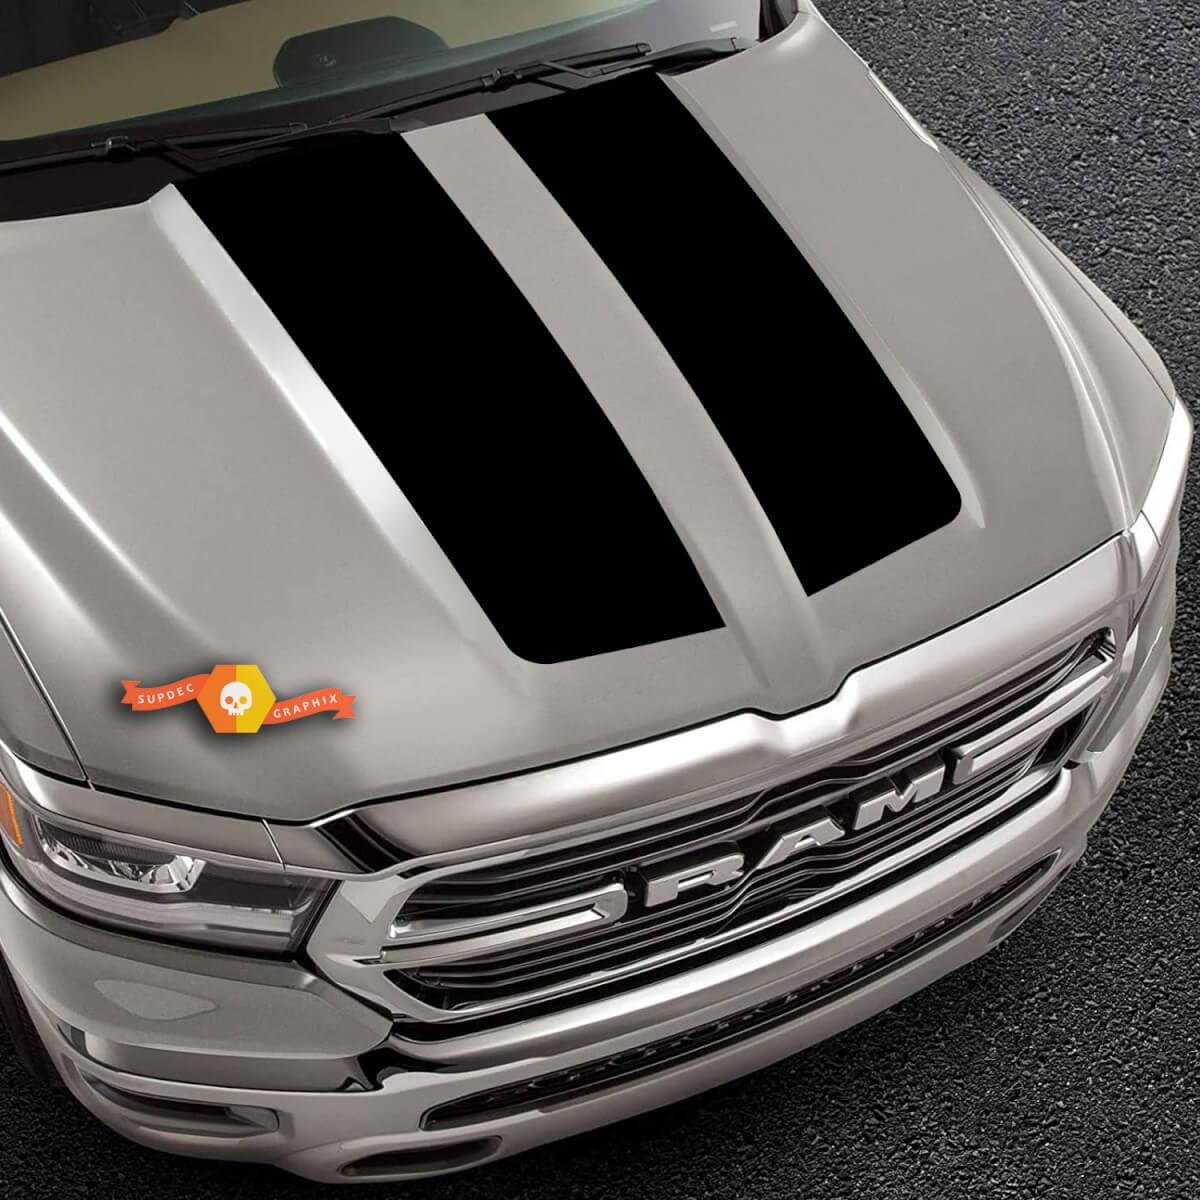 LKW Vinyl Aufkleber 2019-2020 Ram Hood Black Out Design Pickup Fahrzeug Vinyl Grafik Aufkleber Aufkleber